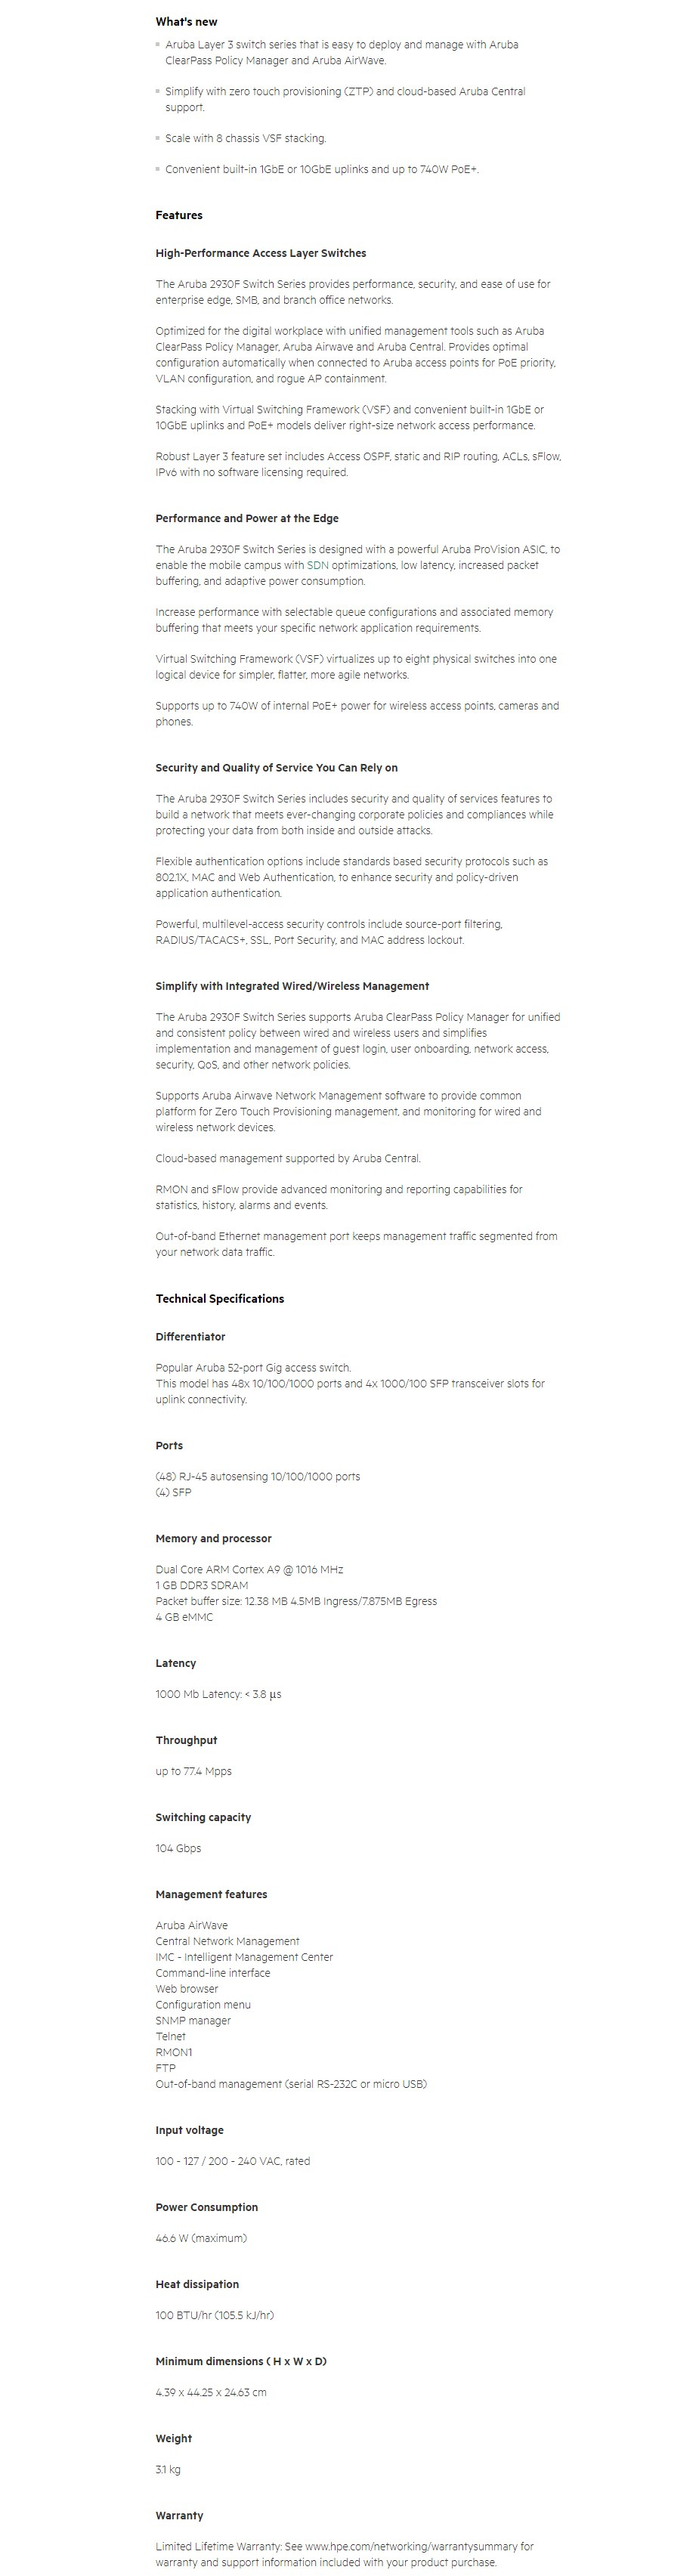 HPE Aruba 2930F 48-Port GbE 4-Port SFP Switch - Overview 1